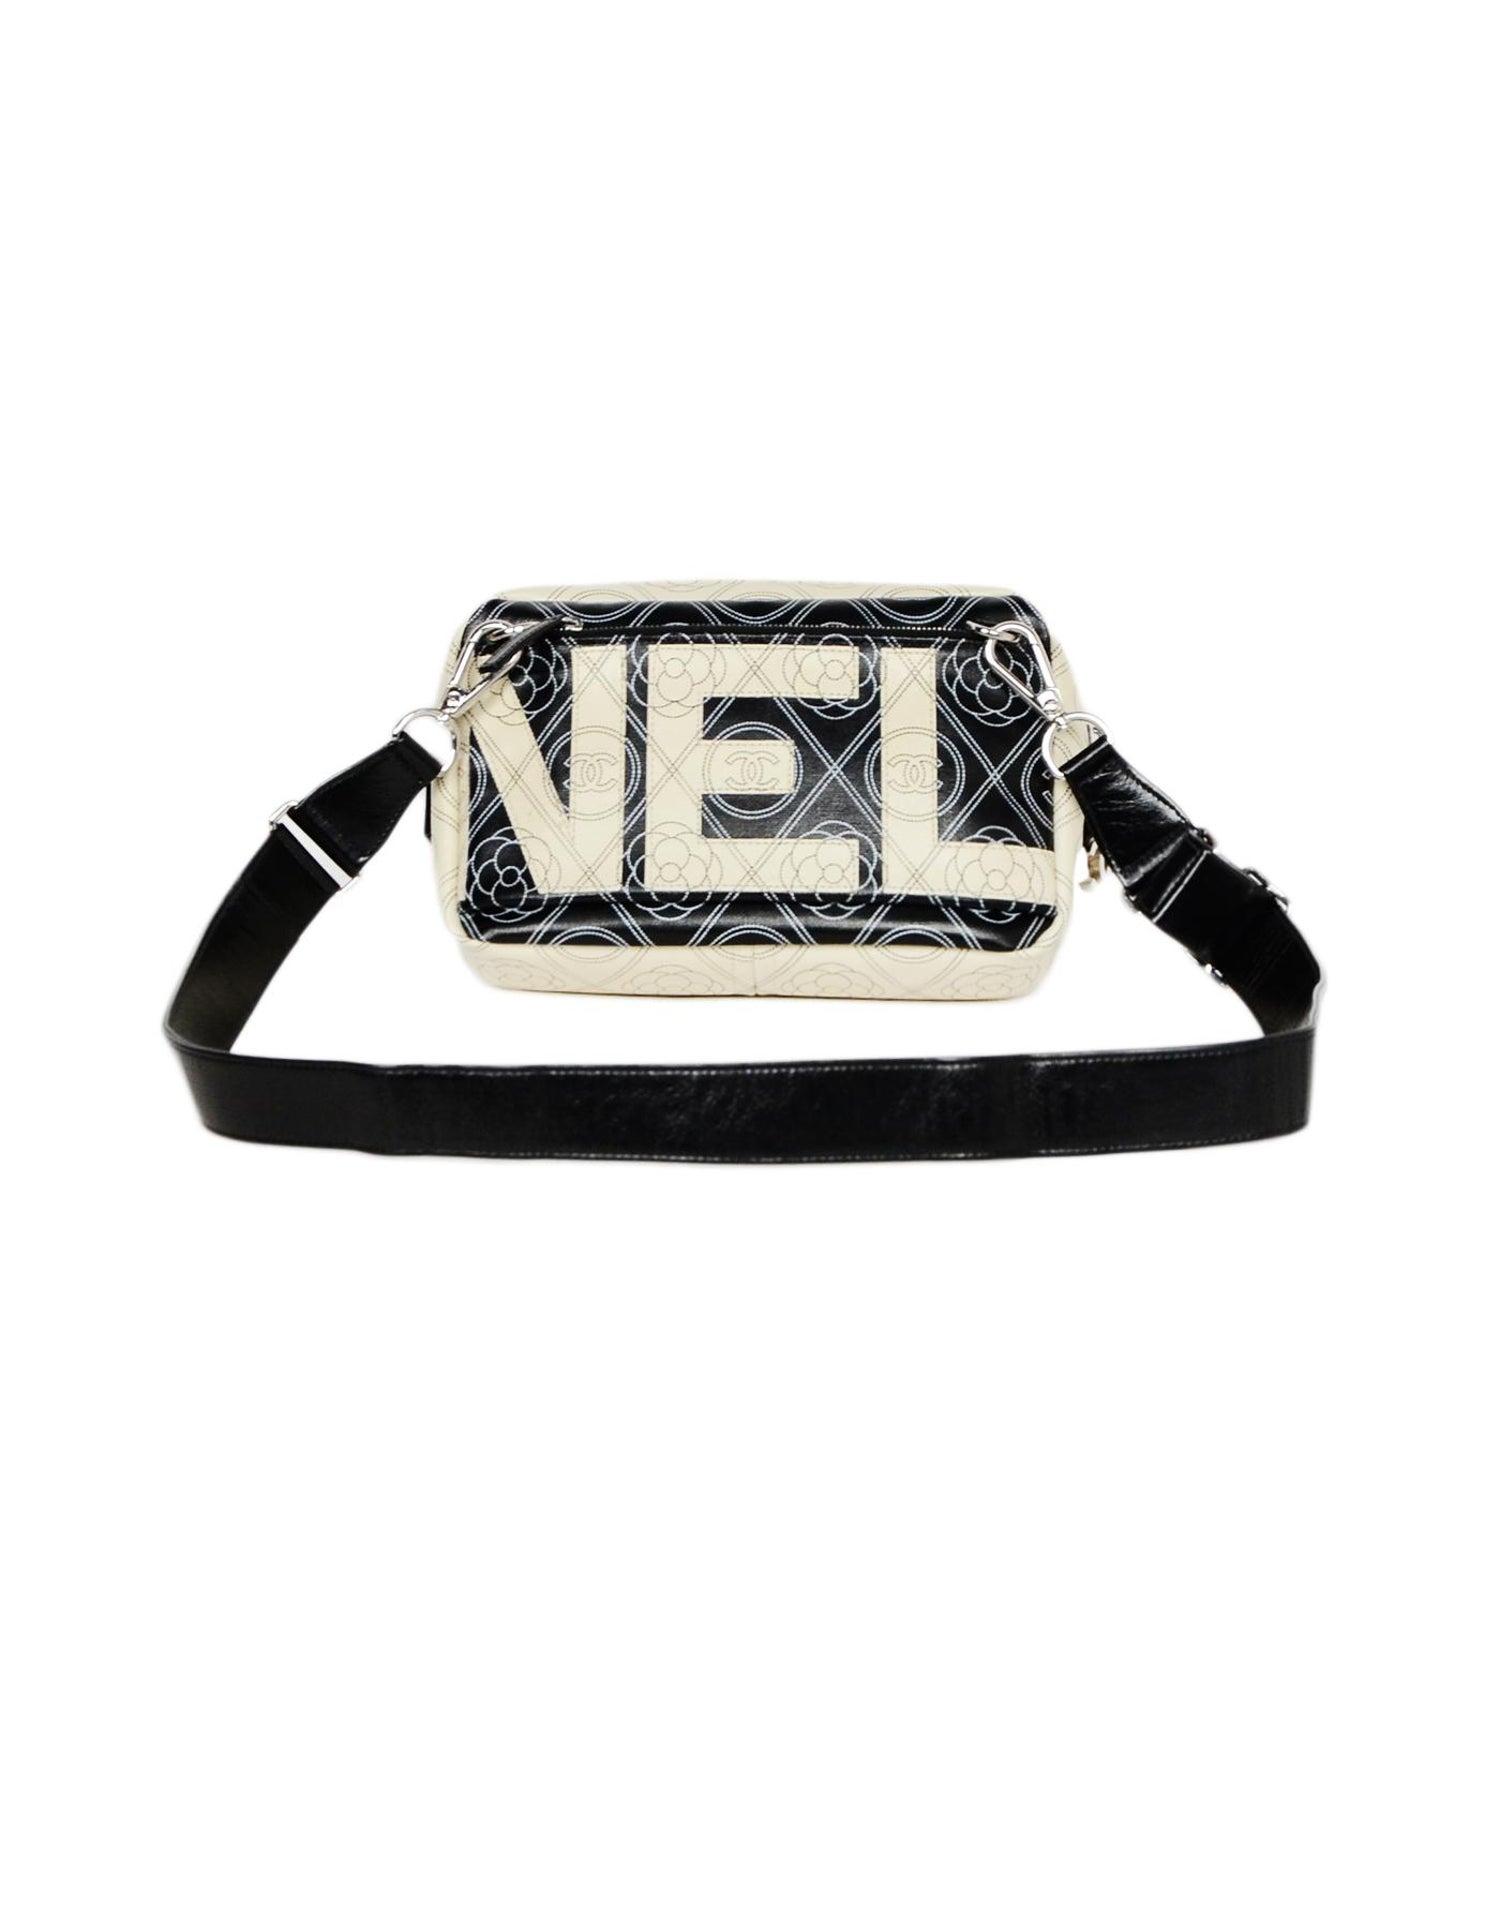 ba60a3fc5 Chanel 2018 Beige/Black Canvas/Leather CC Camelia Printed Belt Bag/Crossbody  For Sale at 1stdibs